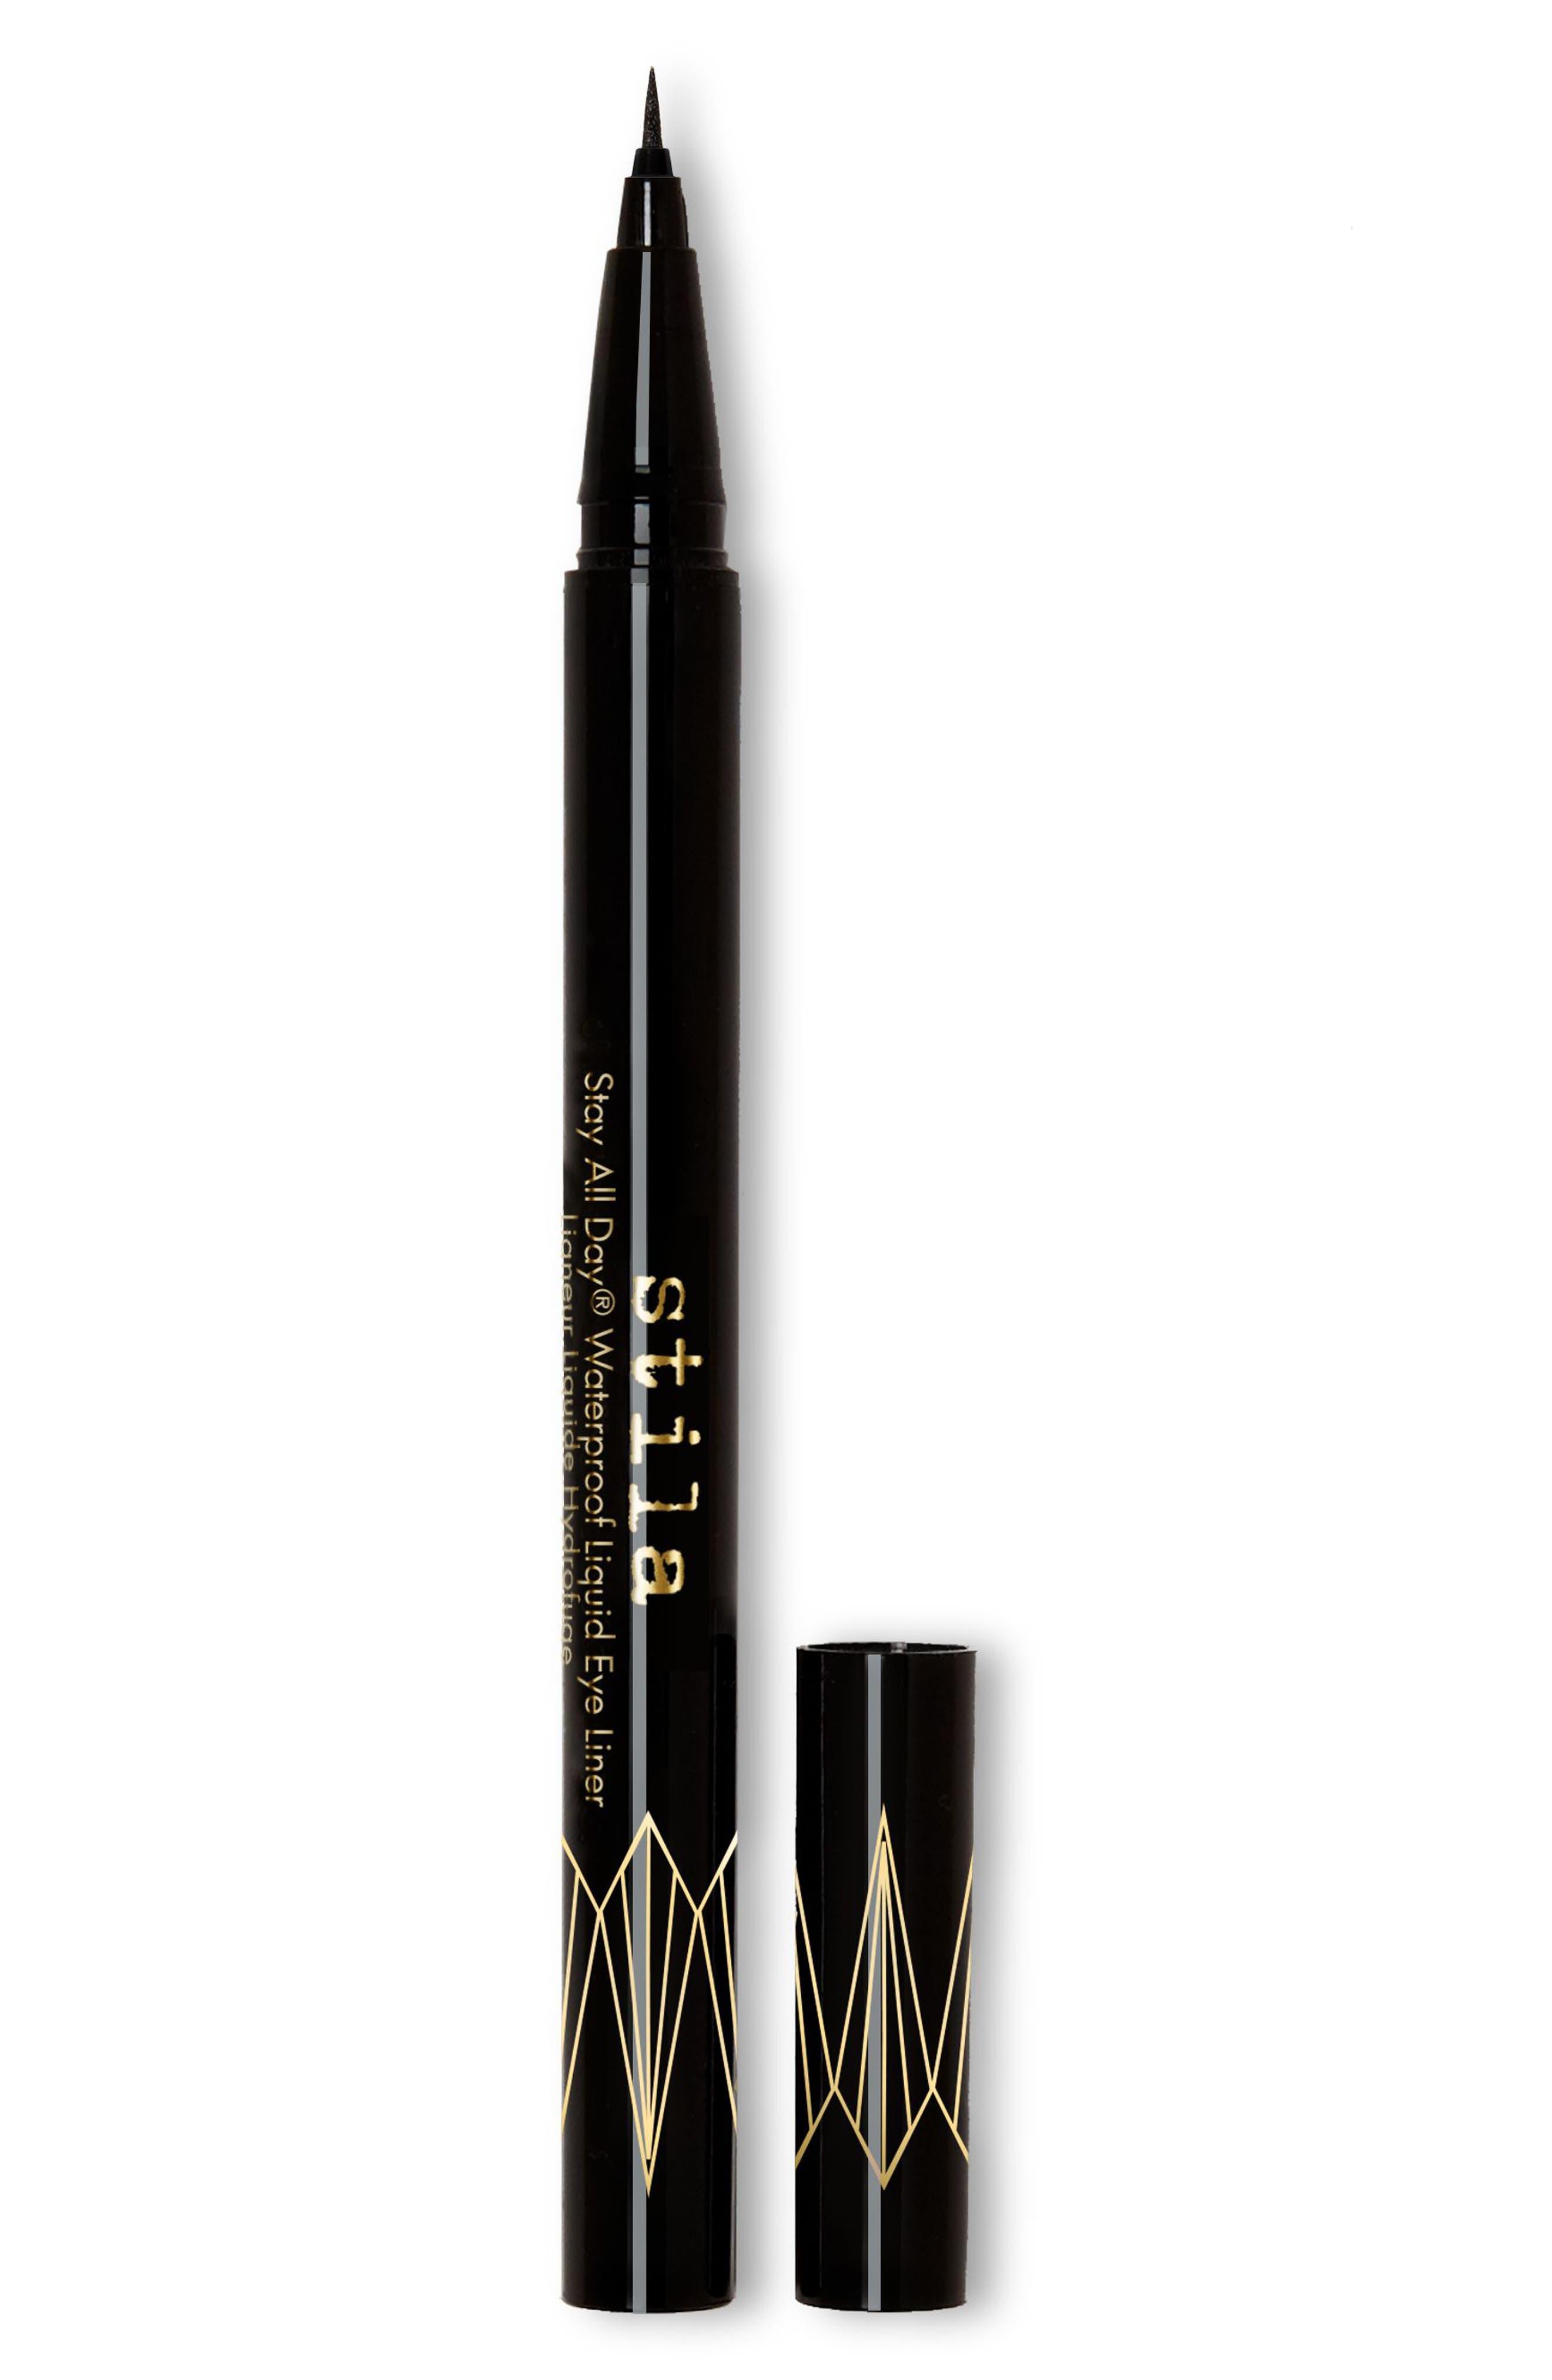 Main Image - Stila Stay All Day® Waterproof Micro Tip Liquid Eyeliner